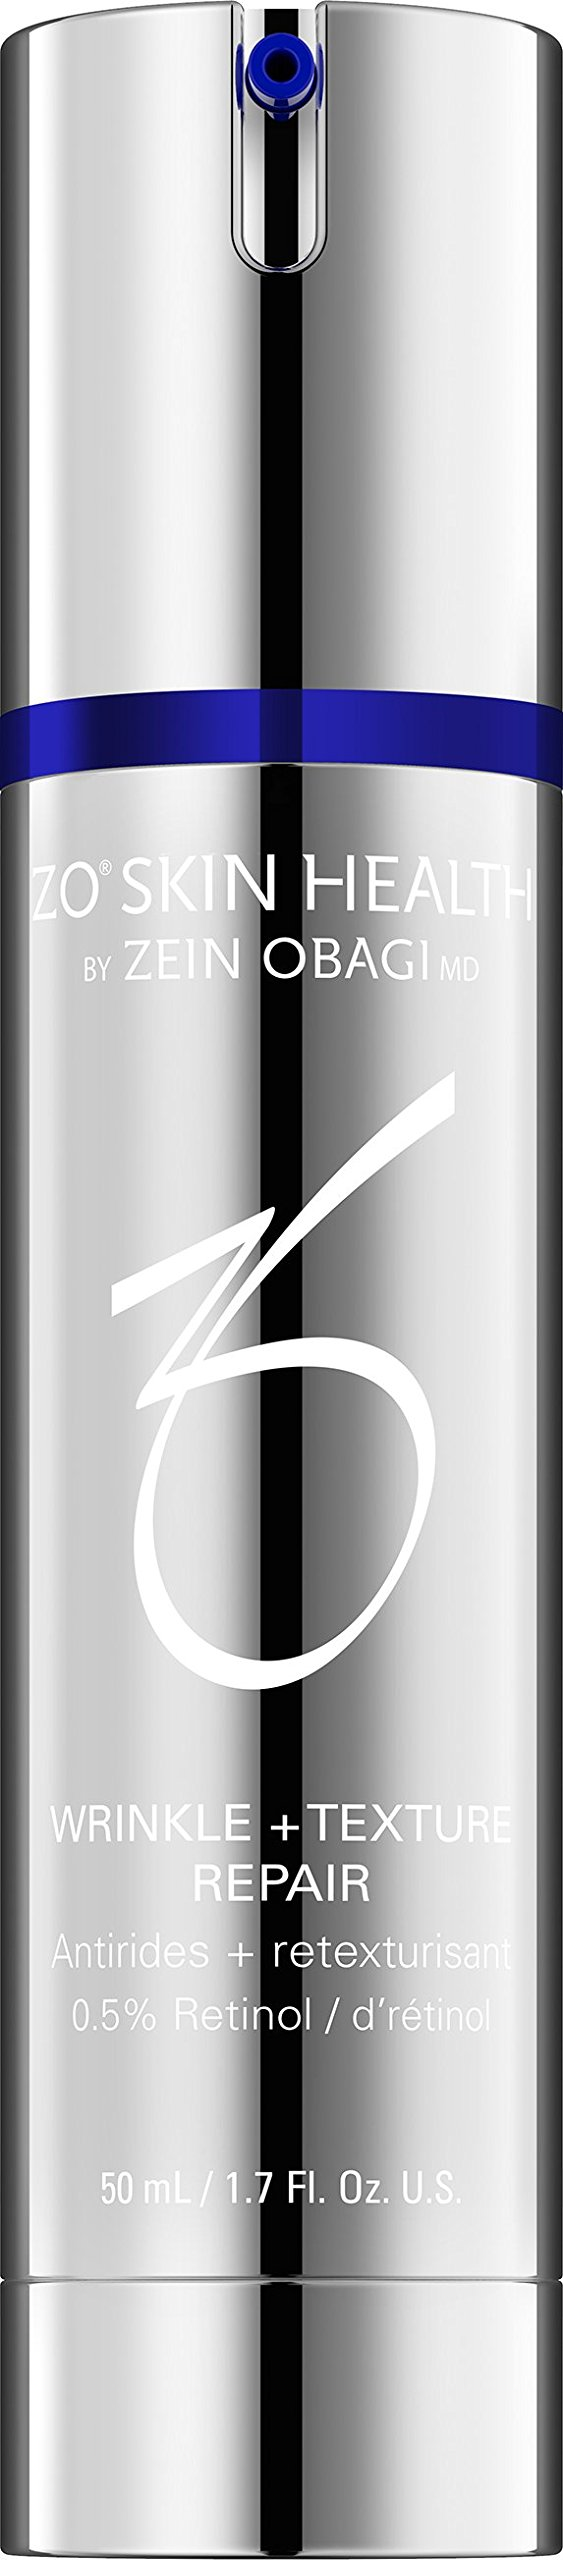 "ZO Skin Health Wrinkle + Texture Repair 1% Retinol--- 1.7 oz/50ml formerly called ""ZO Medical Retamax™ Active Vitamin A Micro Emulsion 1% Retinol"""